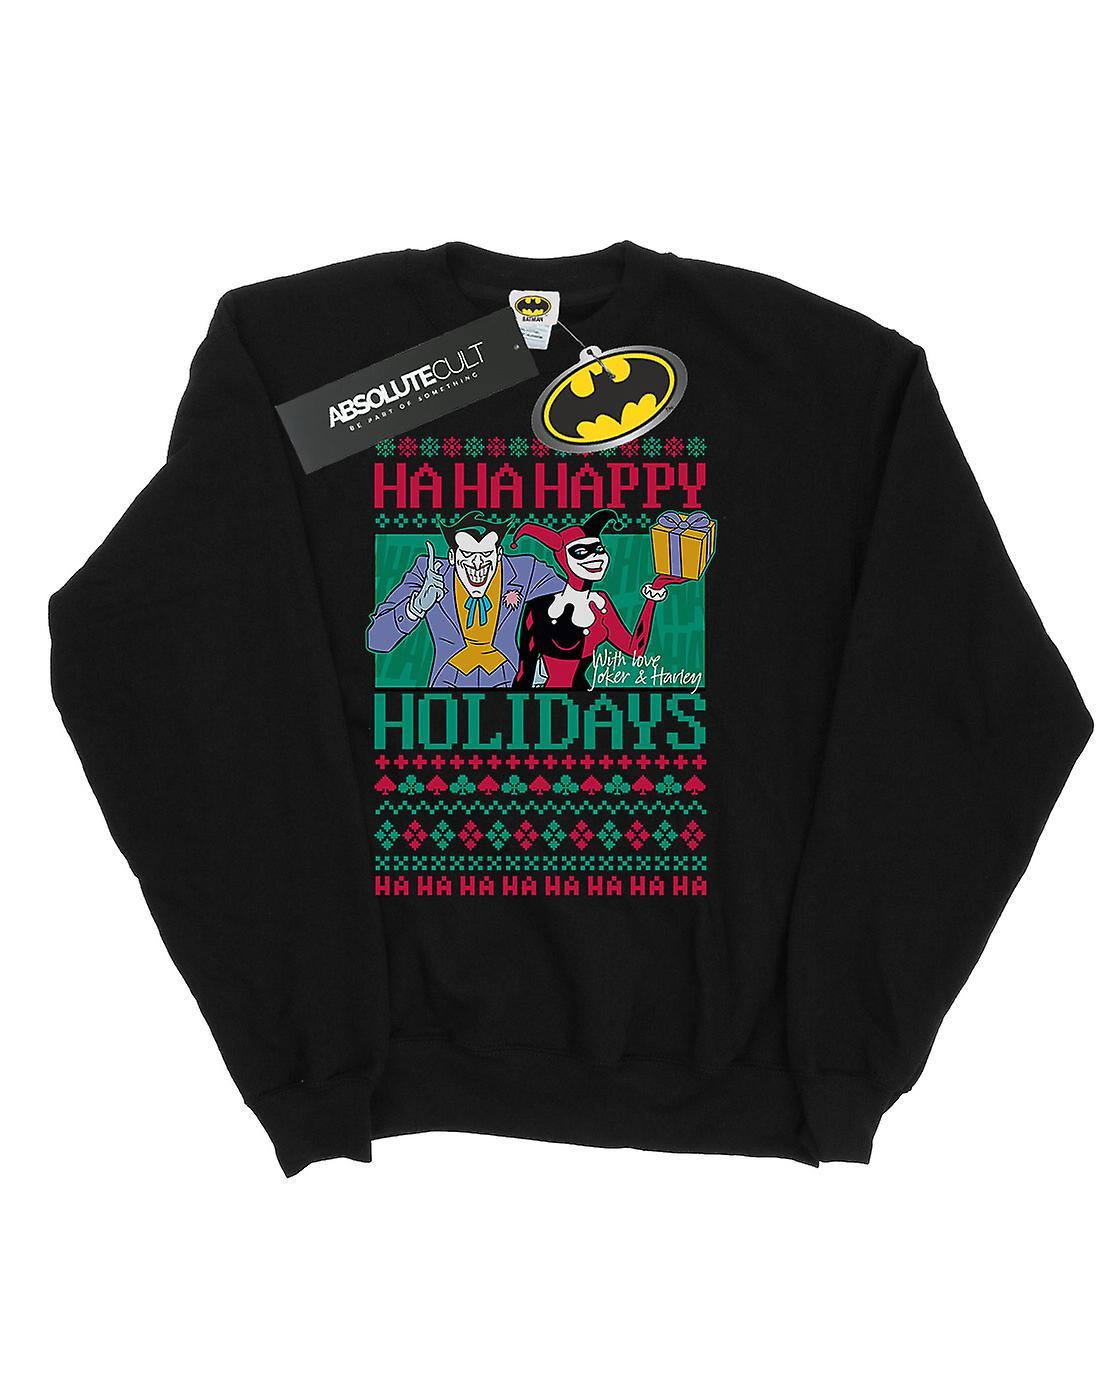 DC Comics Men's Joker And Harley Quinn Ha Ha Happy Holidays Sweatshirt